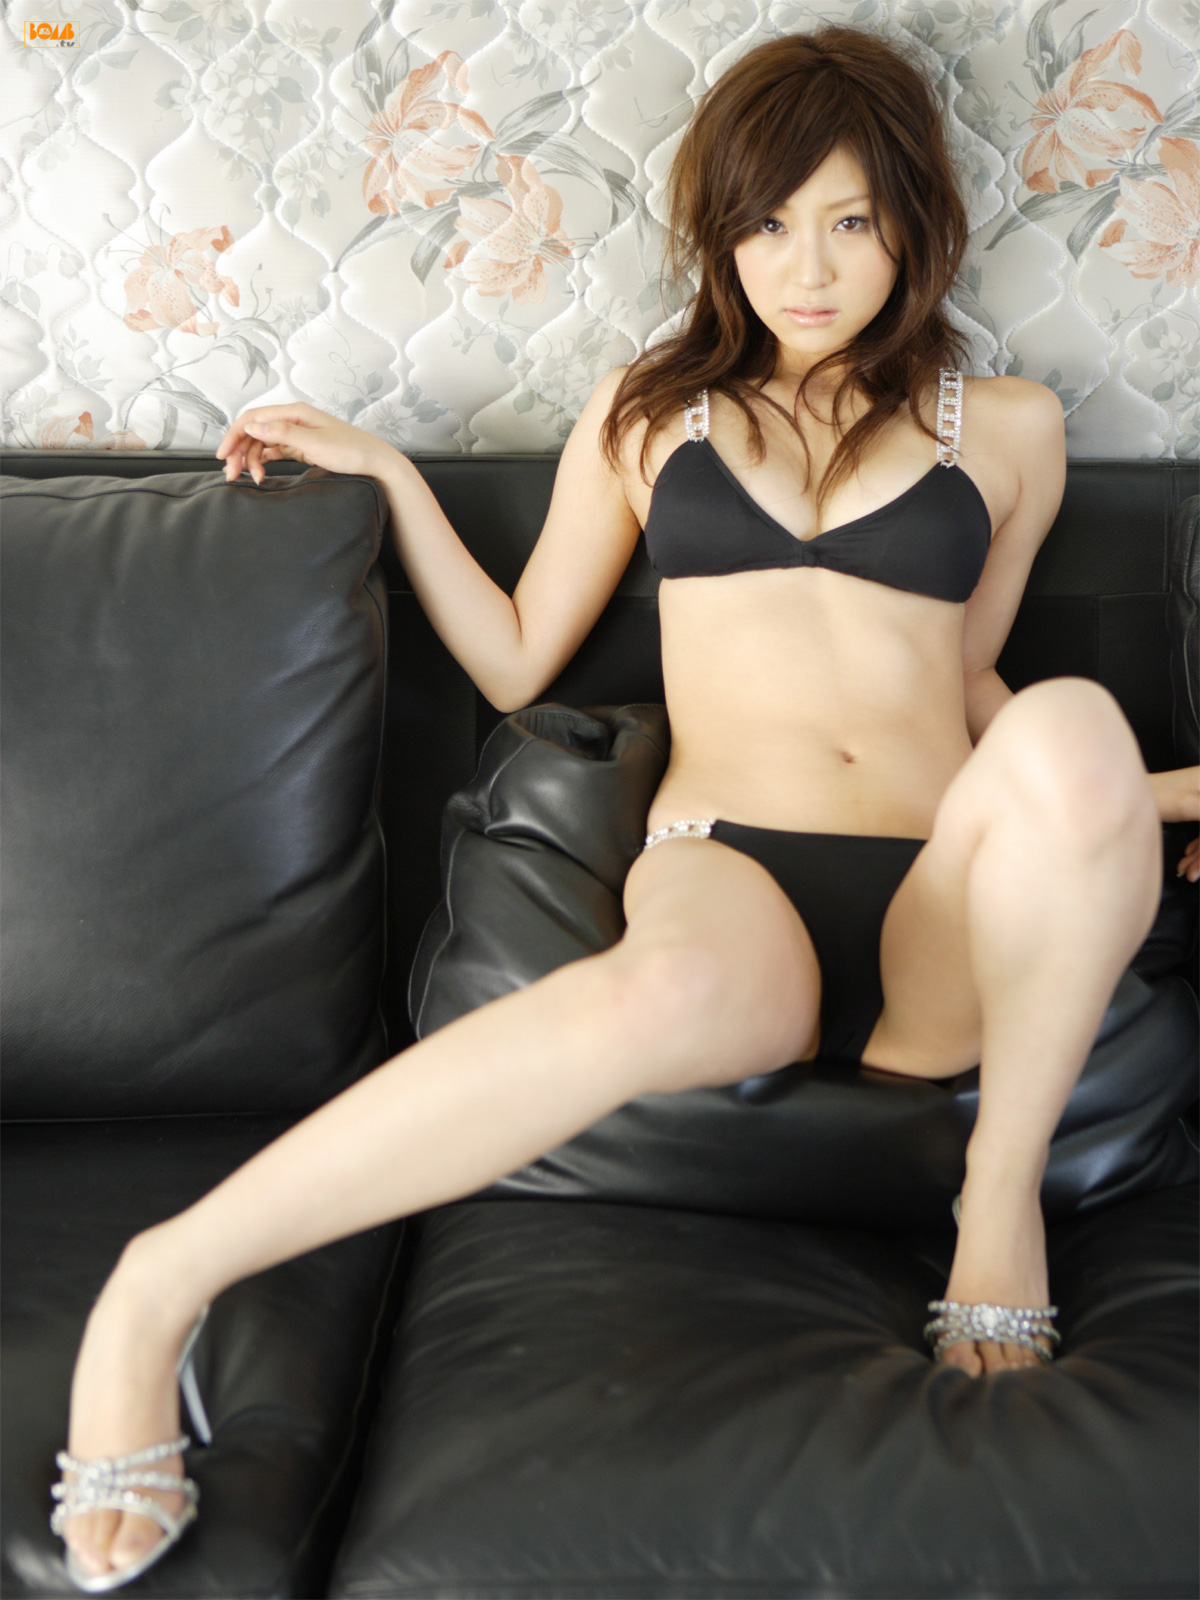 [Bomb.tv] 2007.12 Natsuko Tatsumi 辰巳奈都子 [35P16MB] tn002-jpg